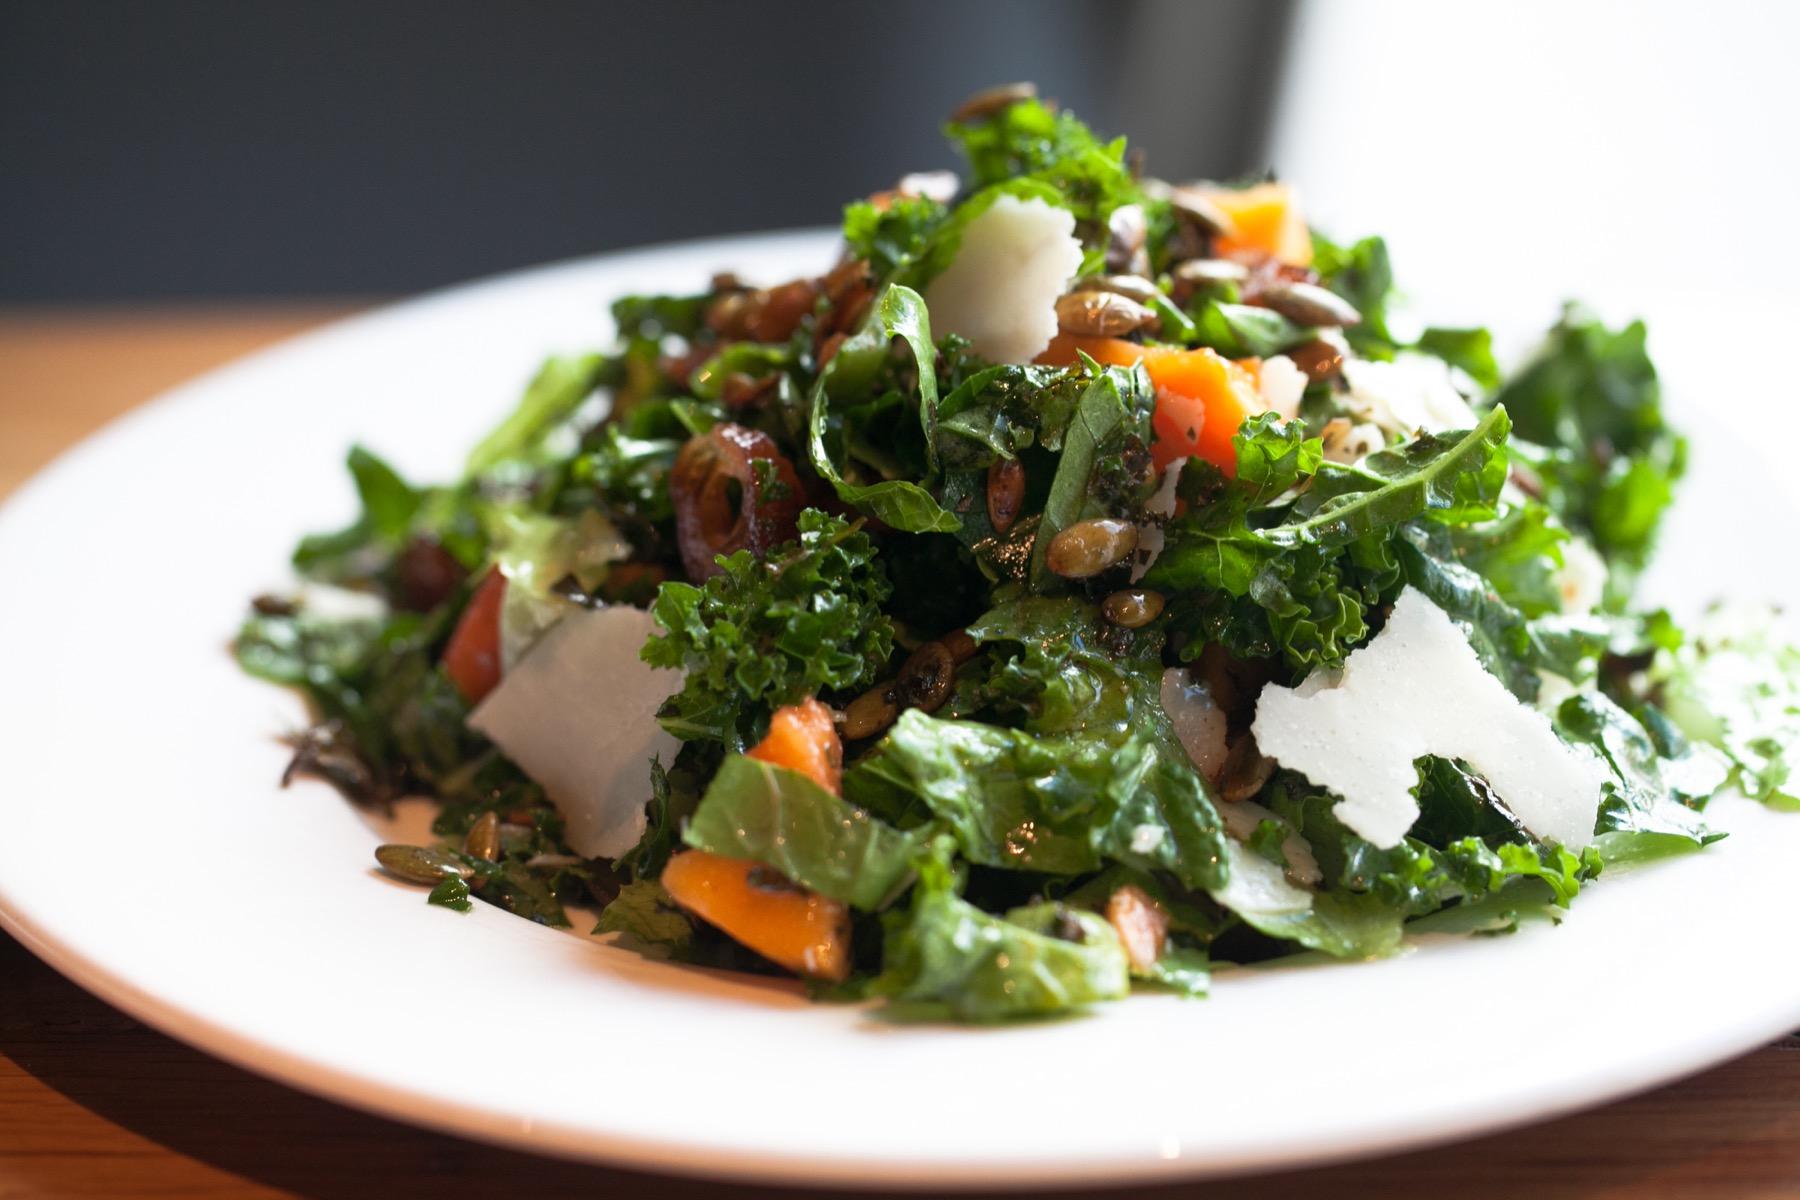 Krispy kale salad at Beatrix